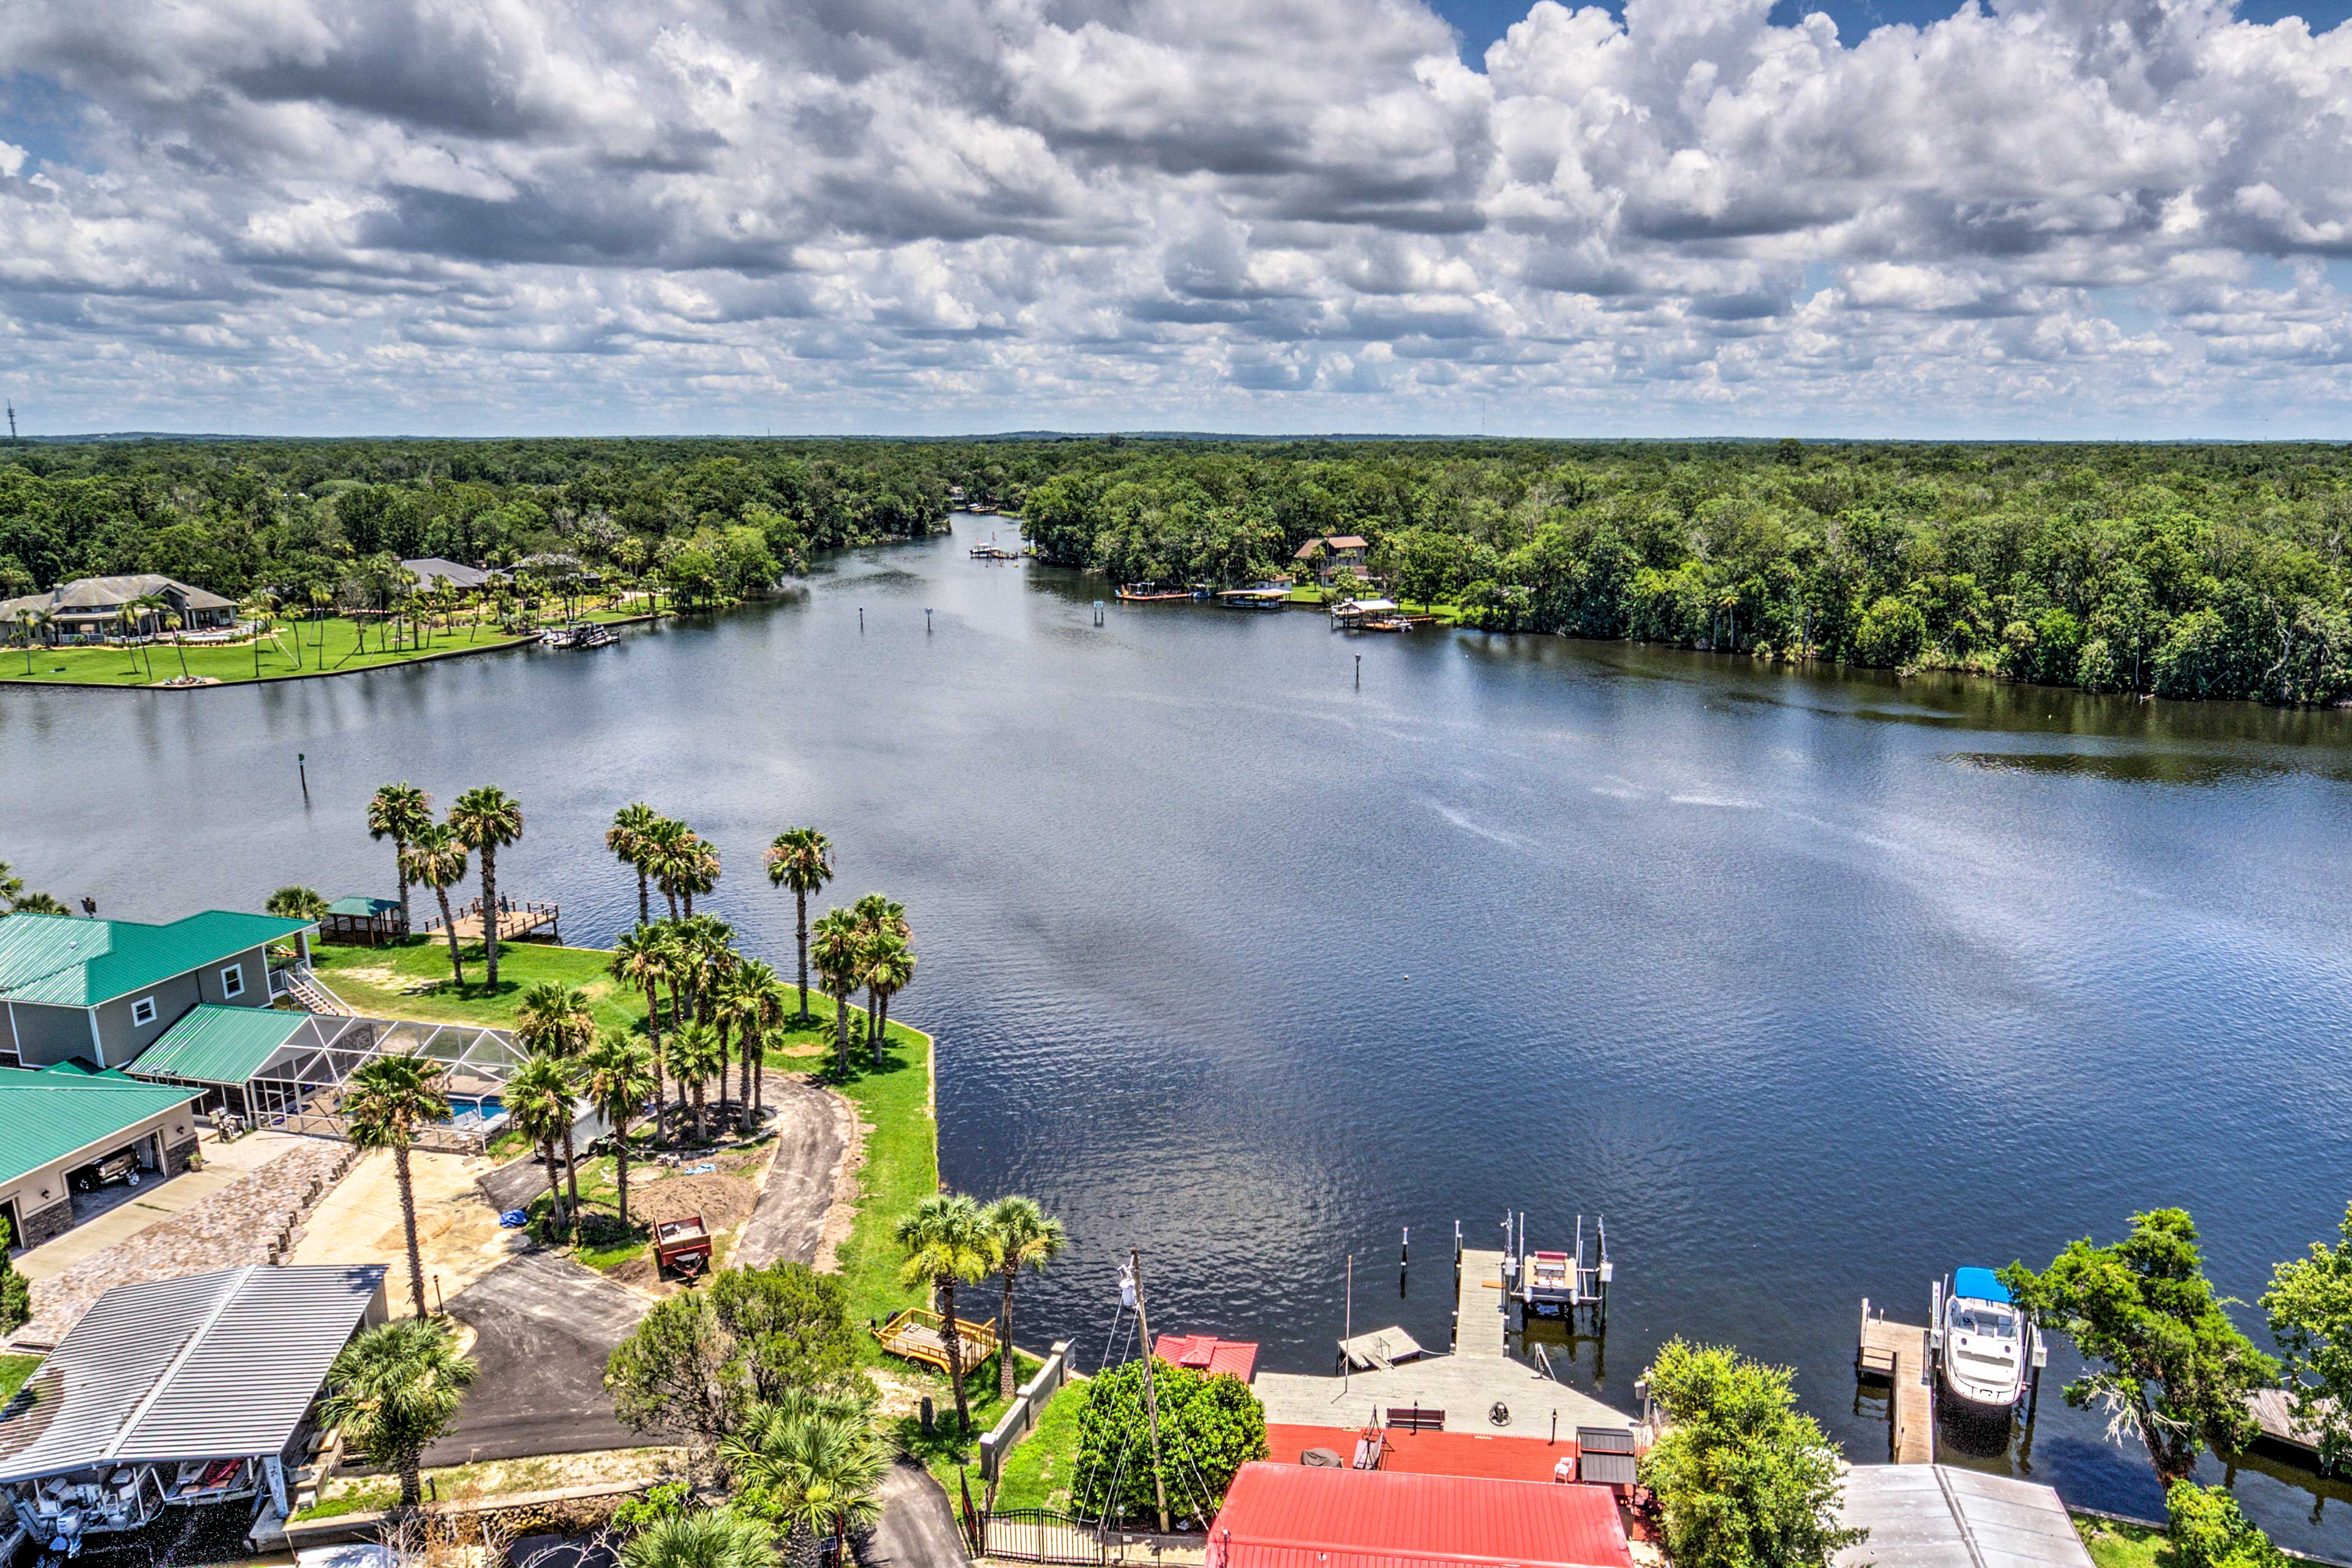 Endless aquatic attractions await!